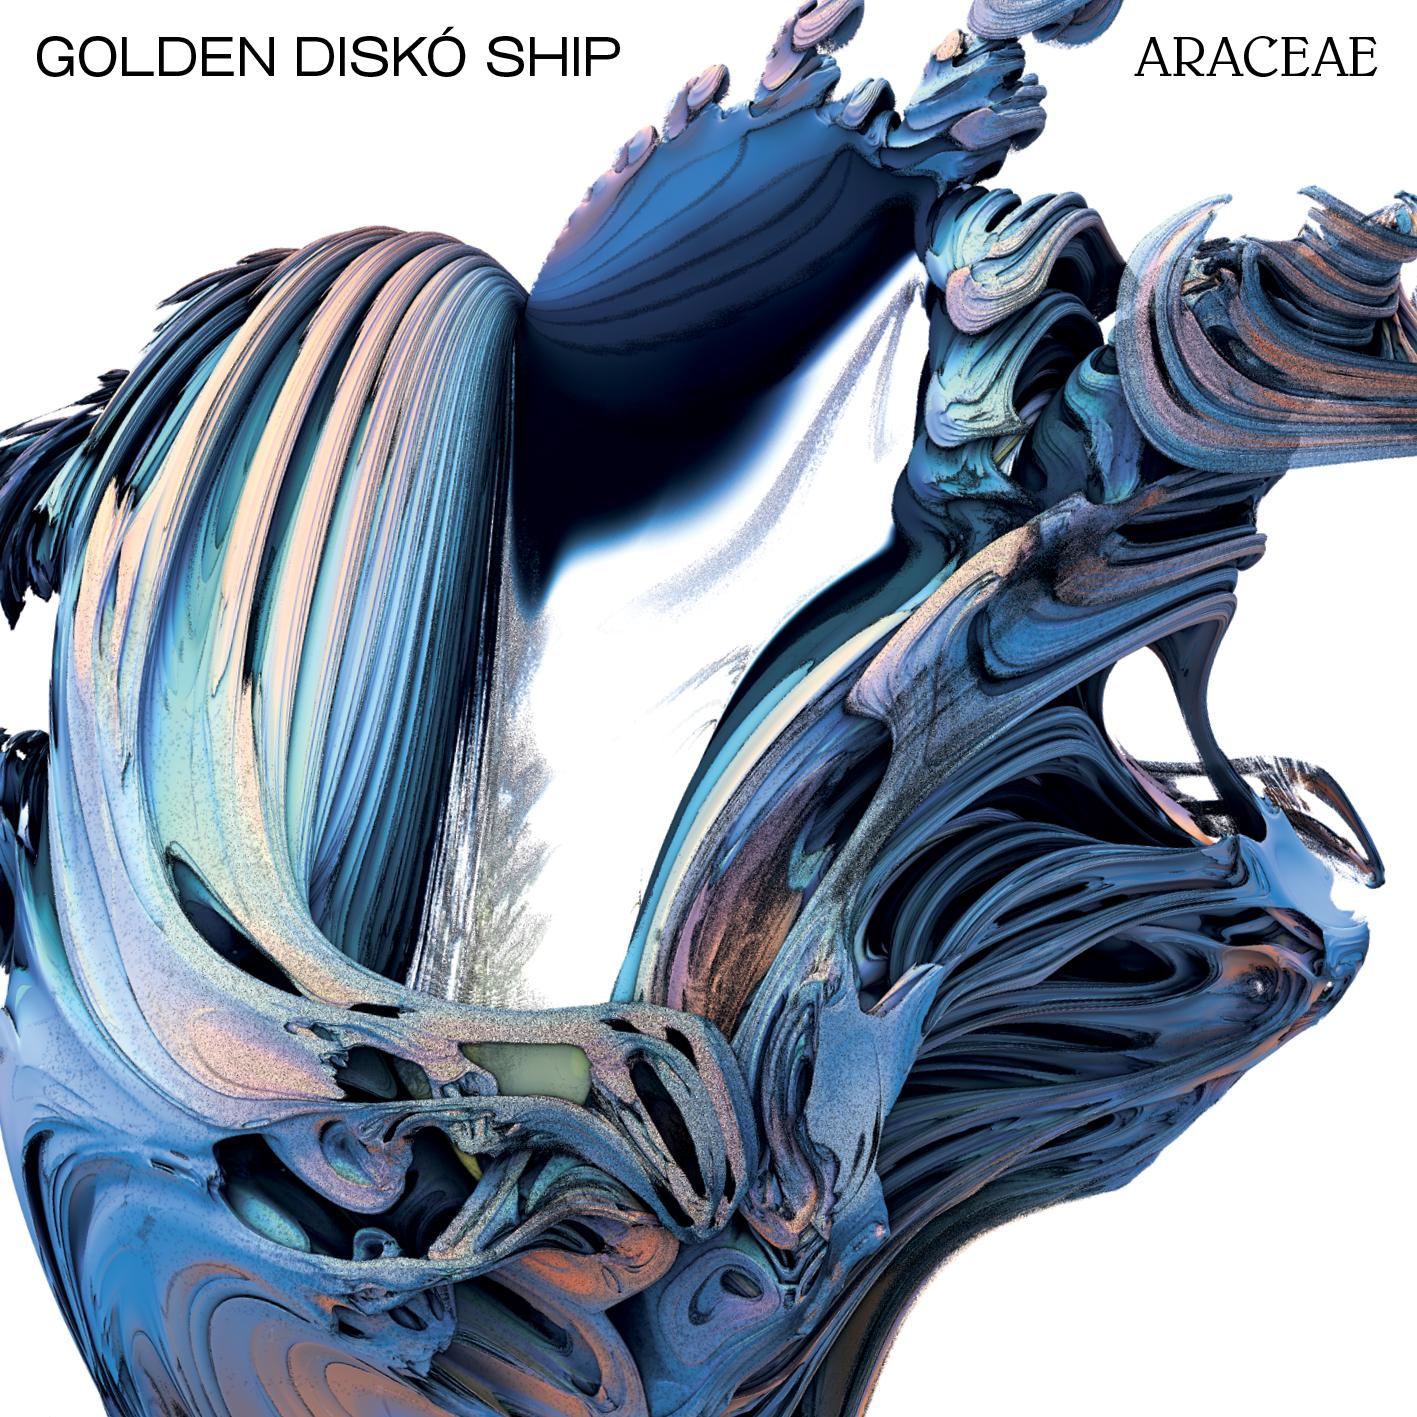 Golden Diskó Ship: Araceae